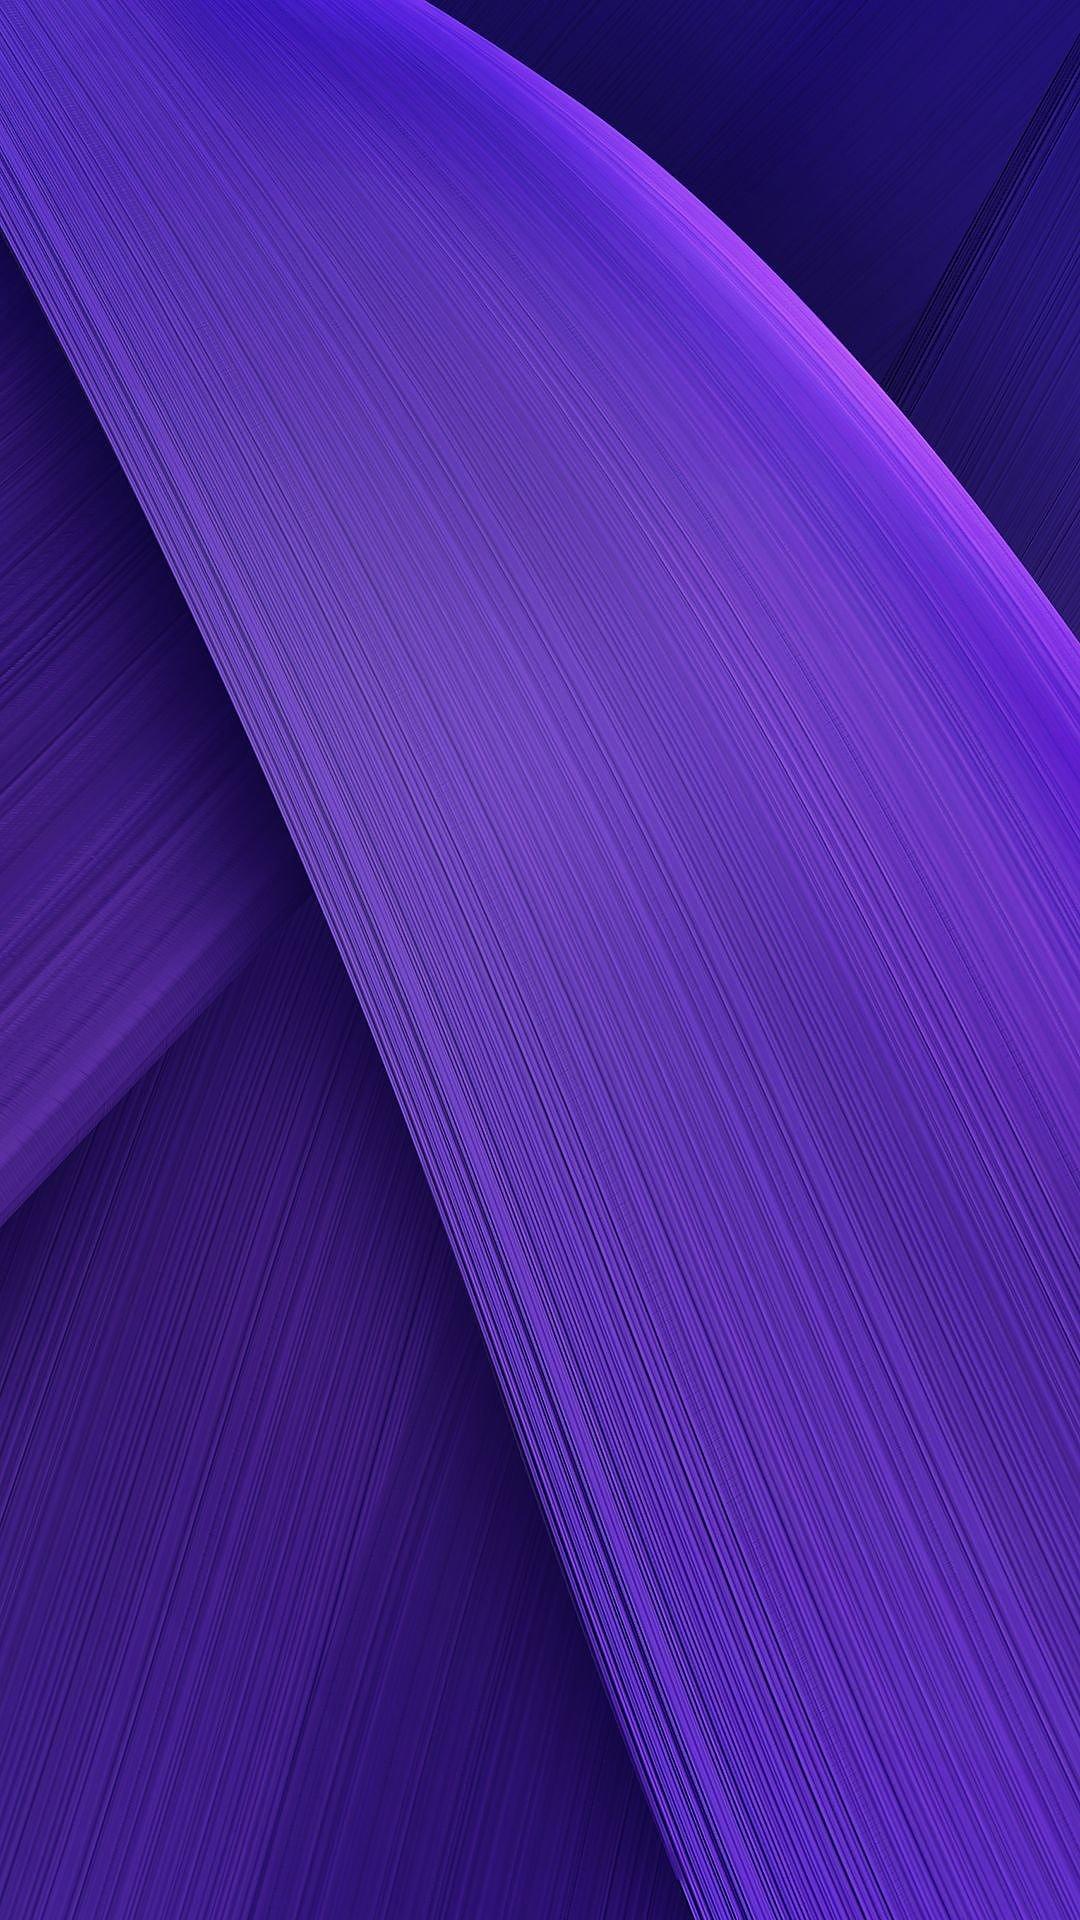 High Quality Zoom Wallpaper - 1080x1920 ...